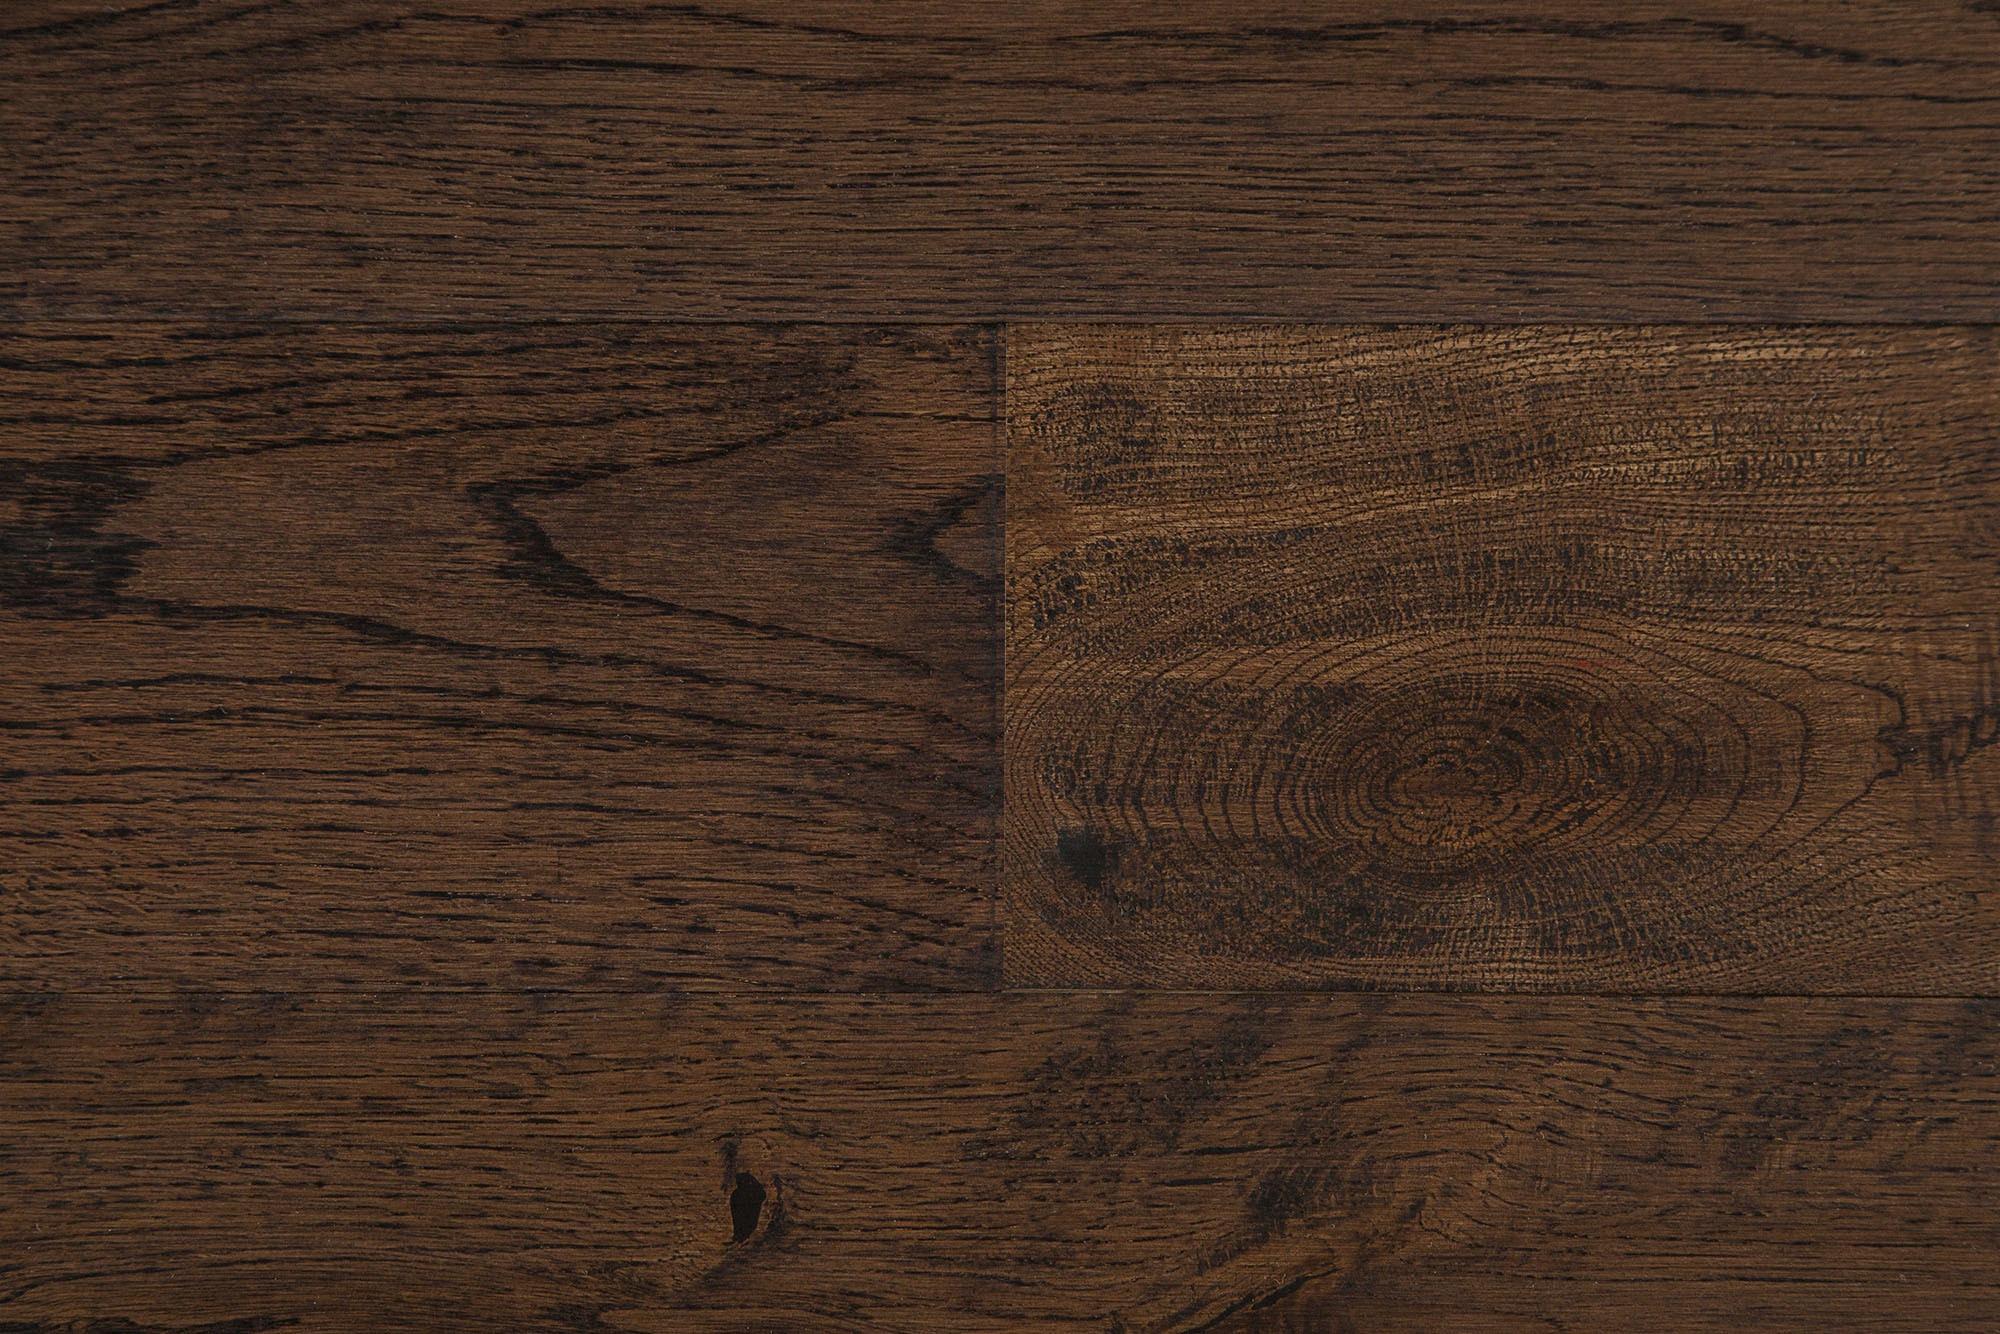 Free Samples Mazama Hardwood Handscraped Tropical Collection